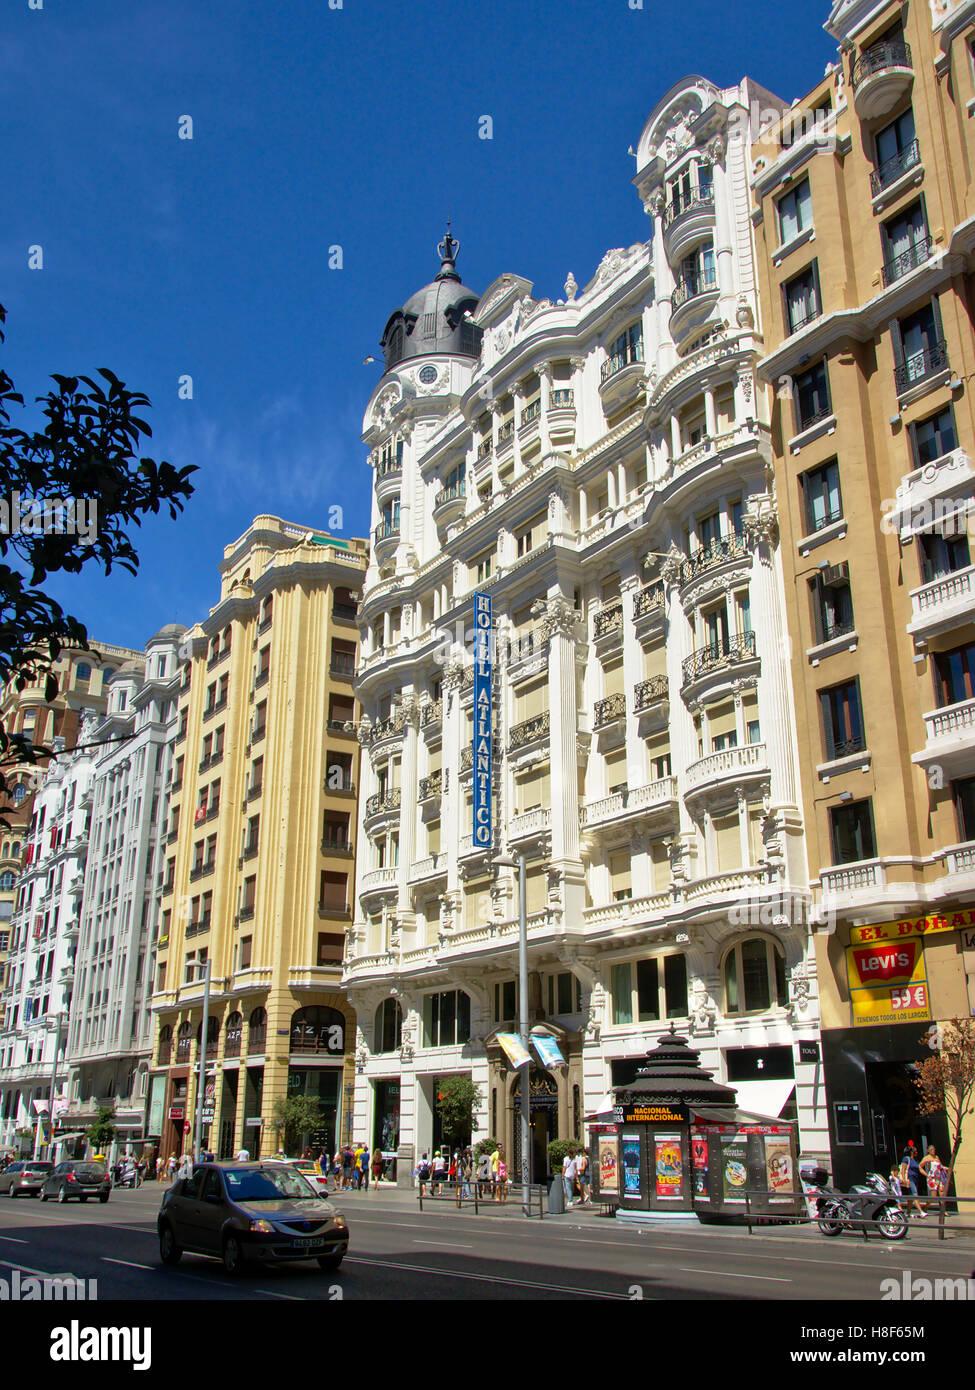 Berühmte Hotel Atlantico im neoklassizistischen Stil an der Gran Via in Madrid, Spanien Stockbild